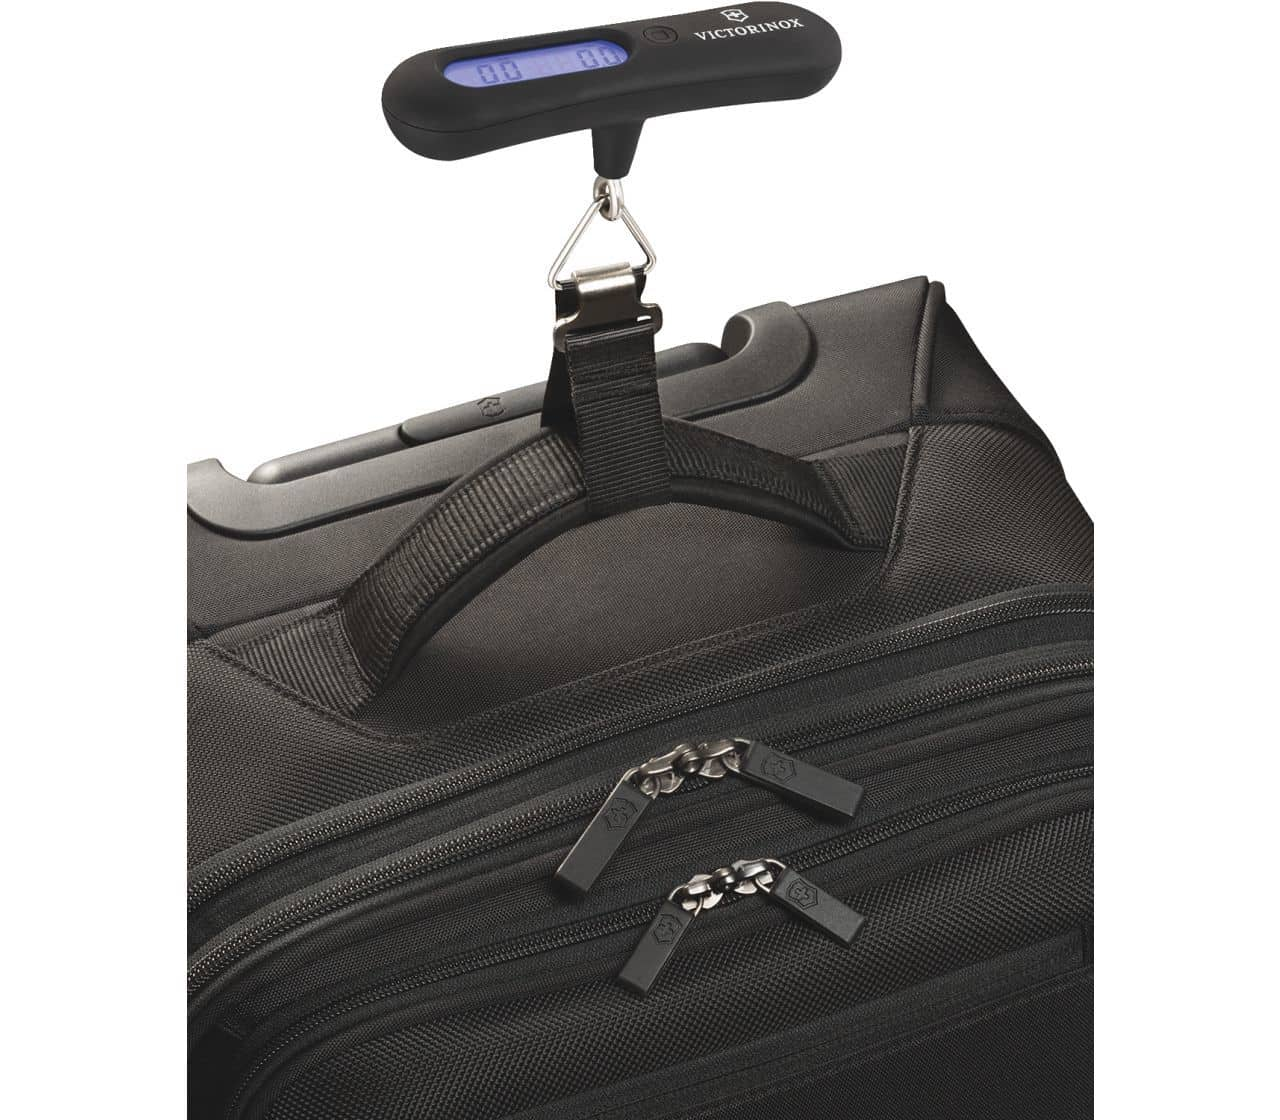 Victorinox Travel Gear - Victorinox Digital Luggage Scale (31370901)